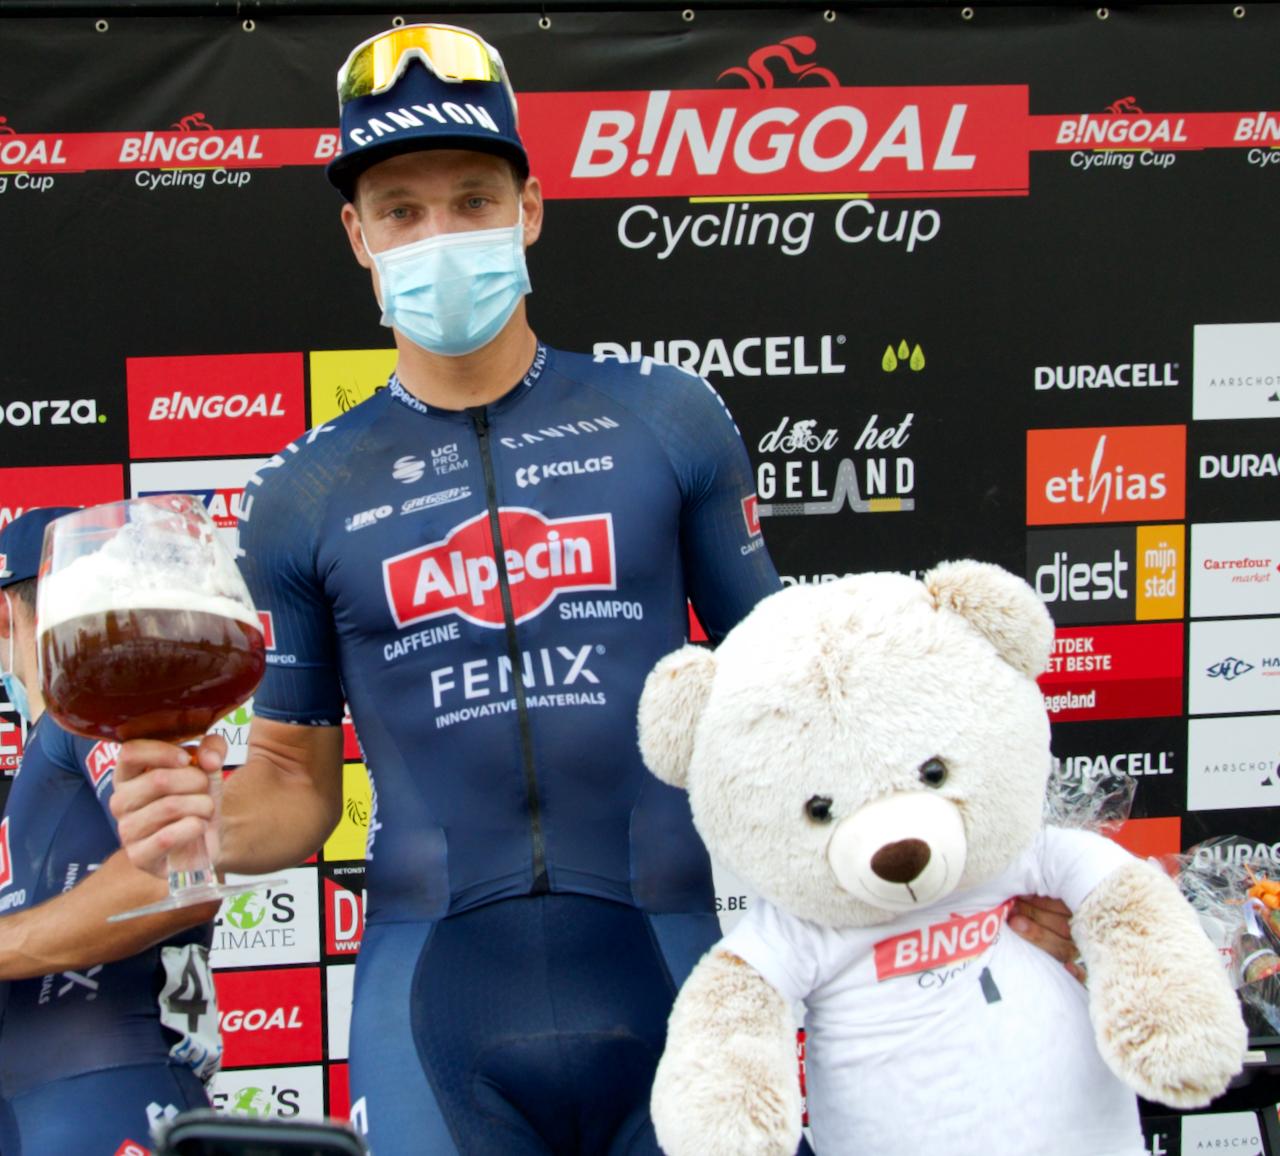 Media - Bingoal Cyling Cup